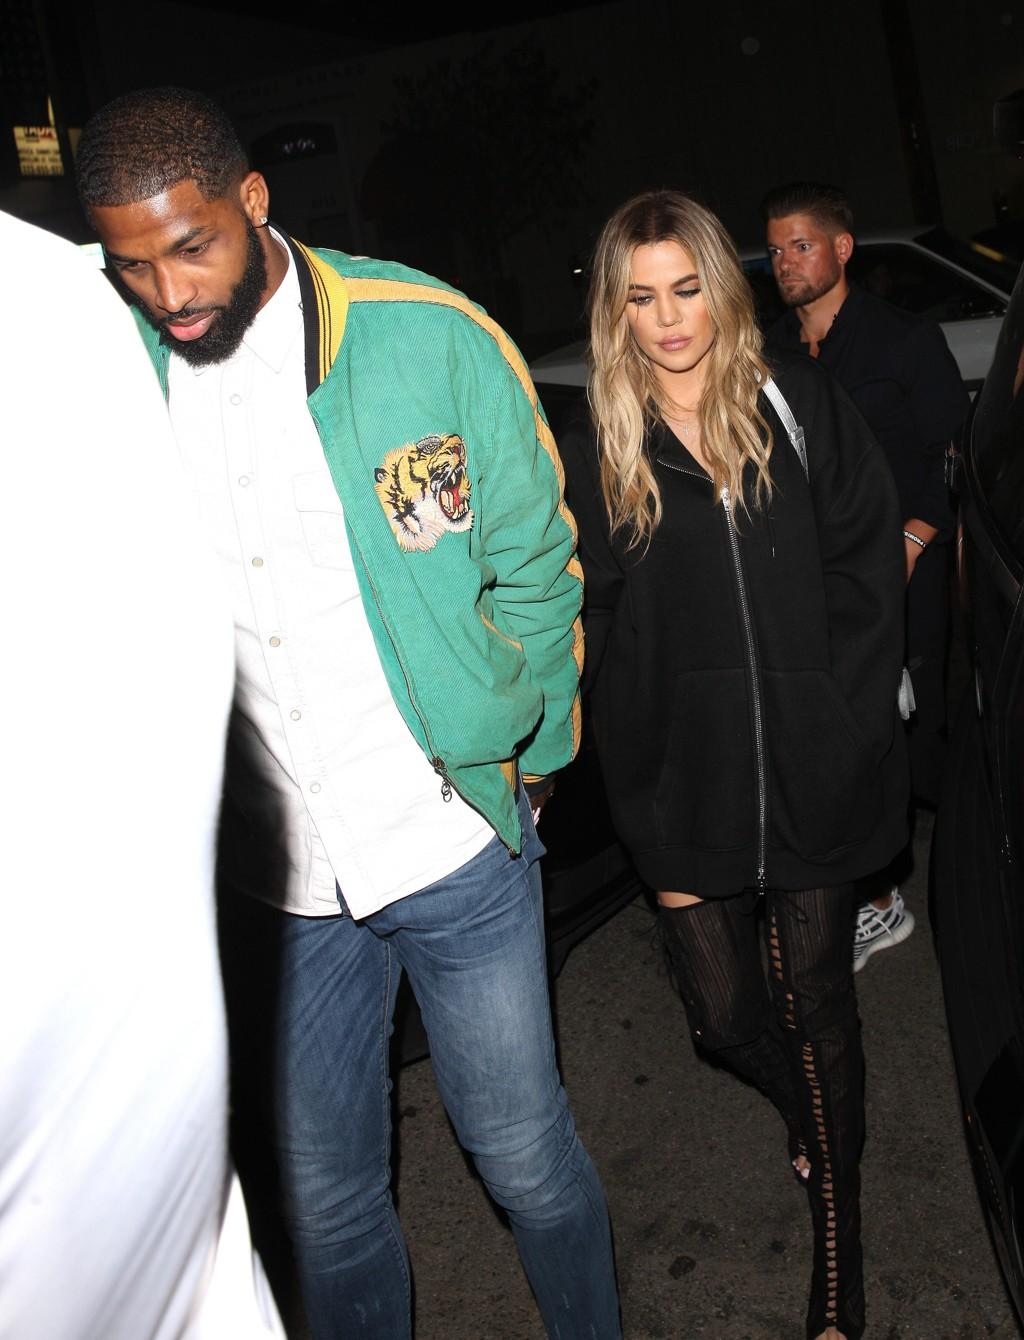 Khloe Kardashian sammen med kjæresten Tristan Thompson. De to skal angivelig vente barn sammen, i likhet med Khloes yngre halvsøster Kylie Jenner.